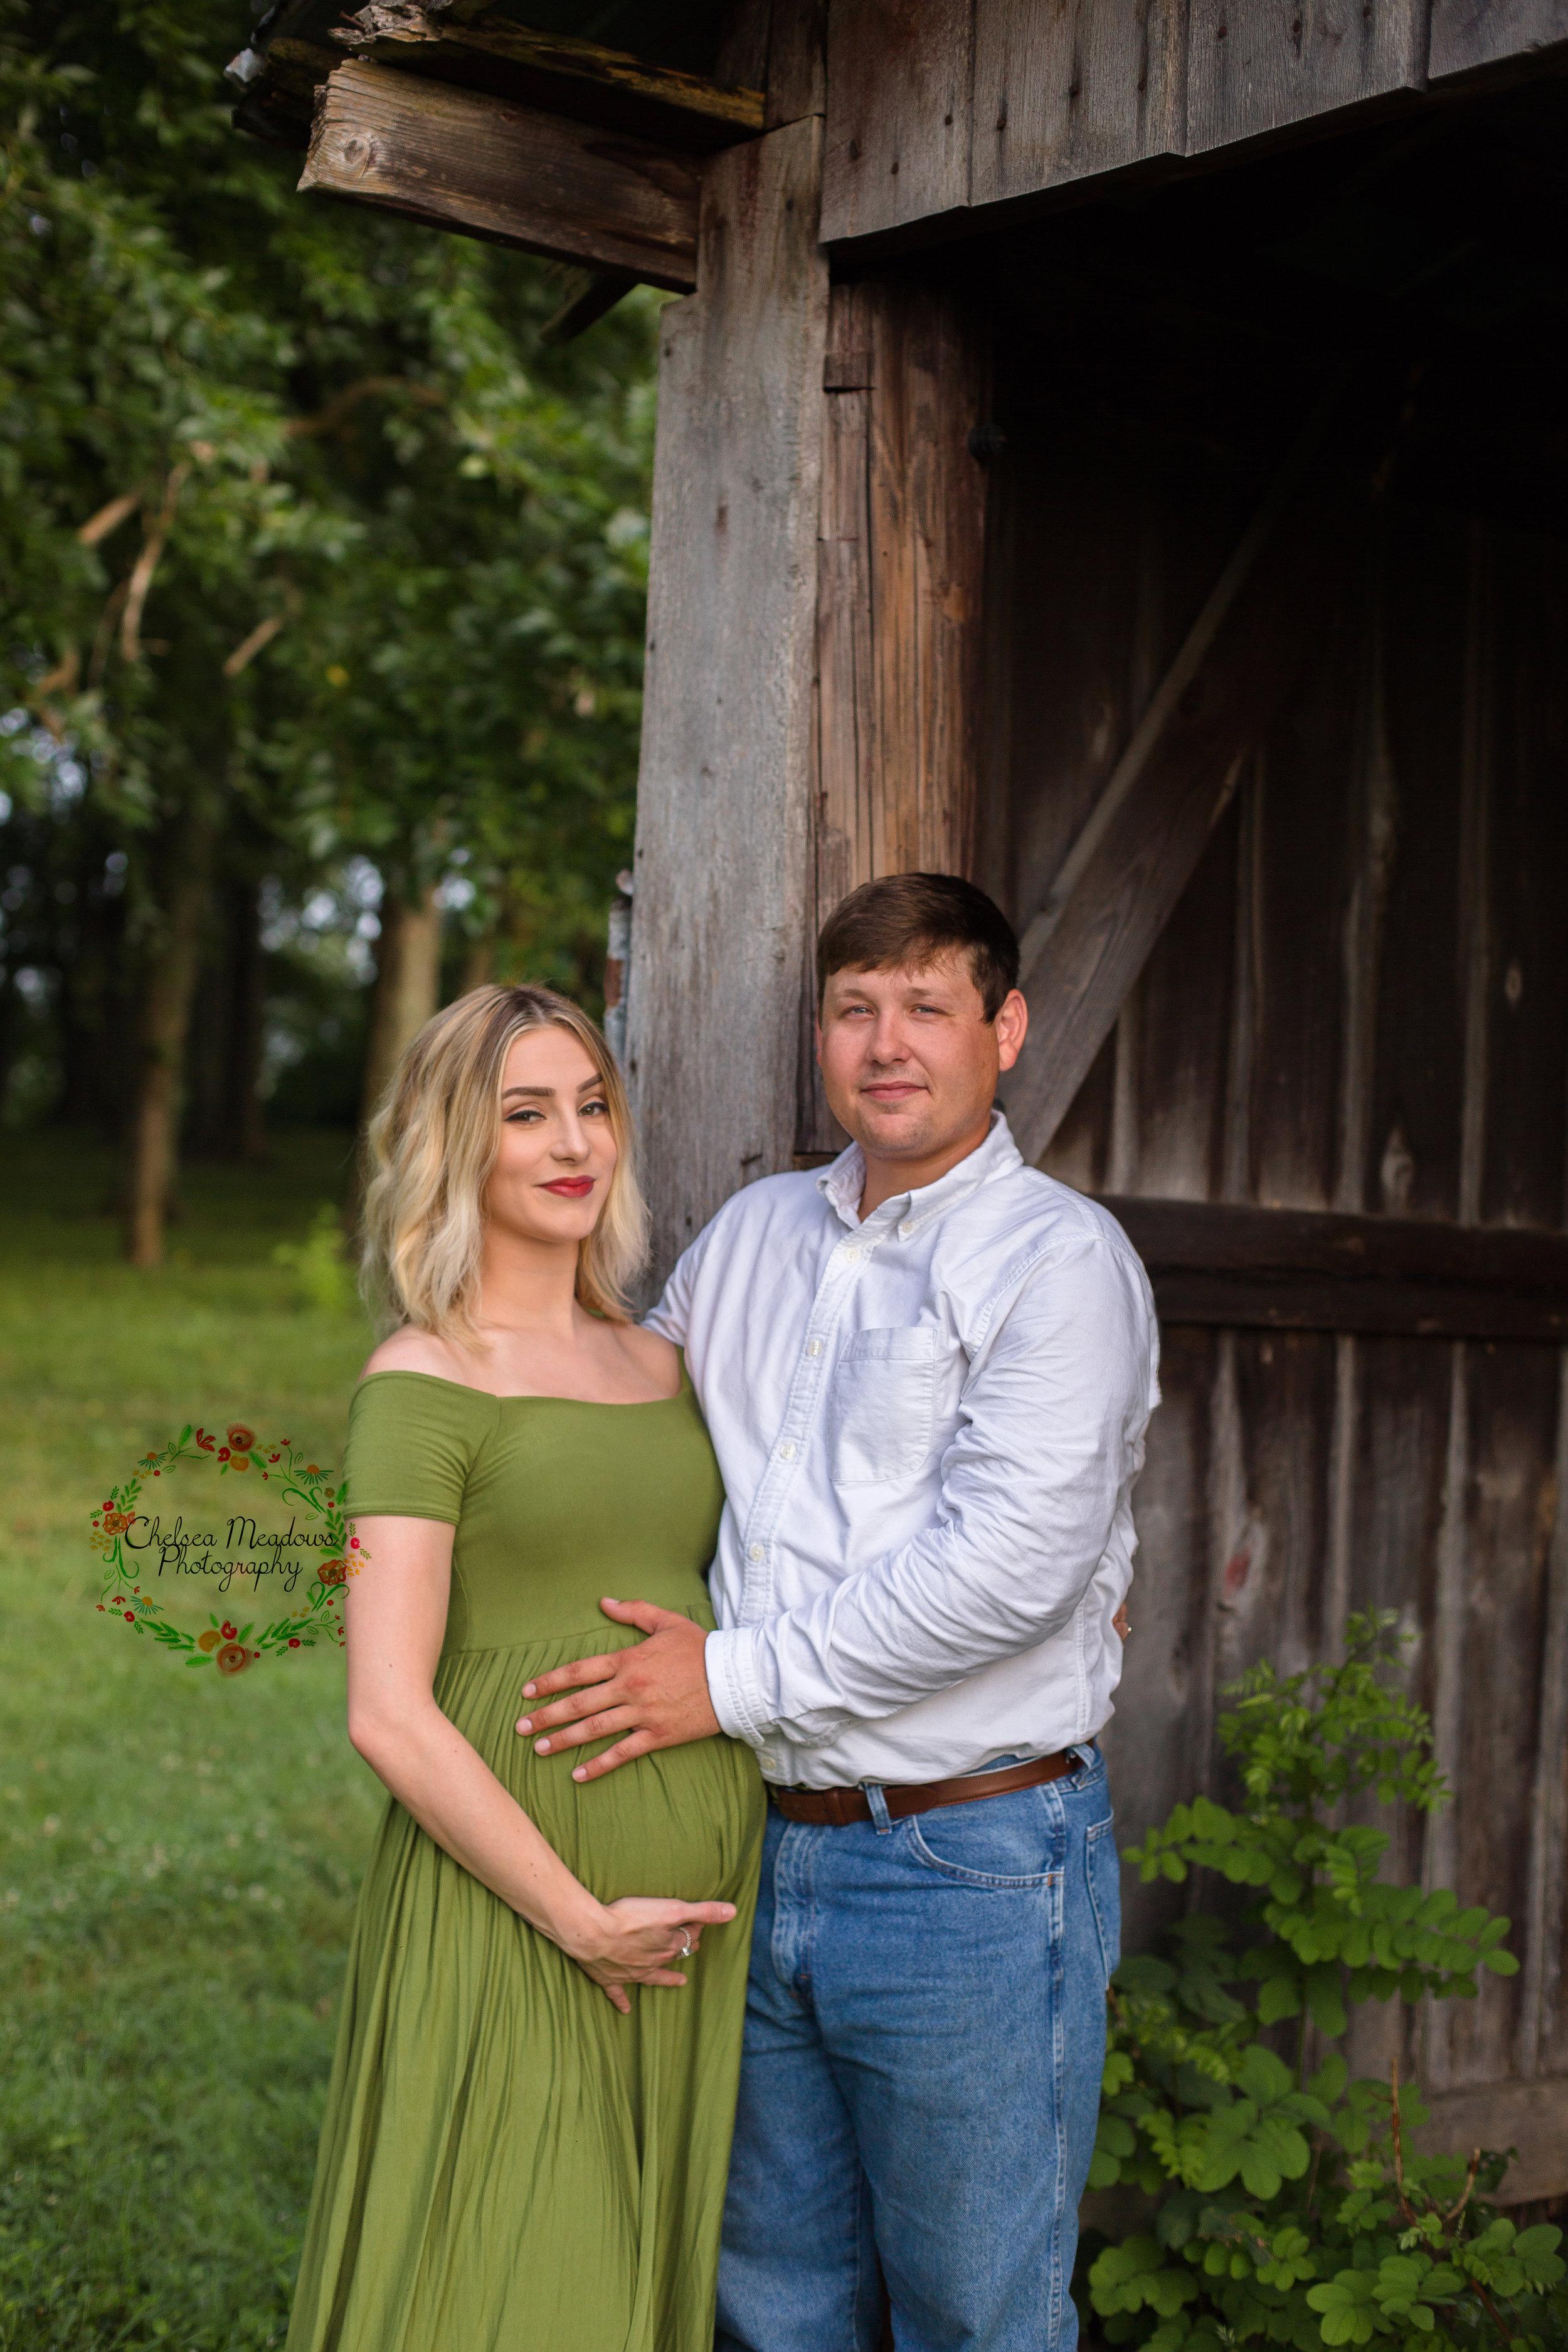 Maya Costanza Maternity - Nashville Maternity Photographer - Chelsea Meadows Photography (82).jpg